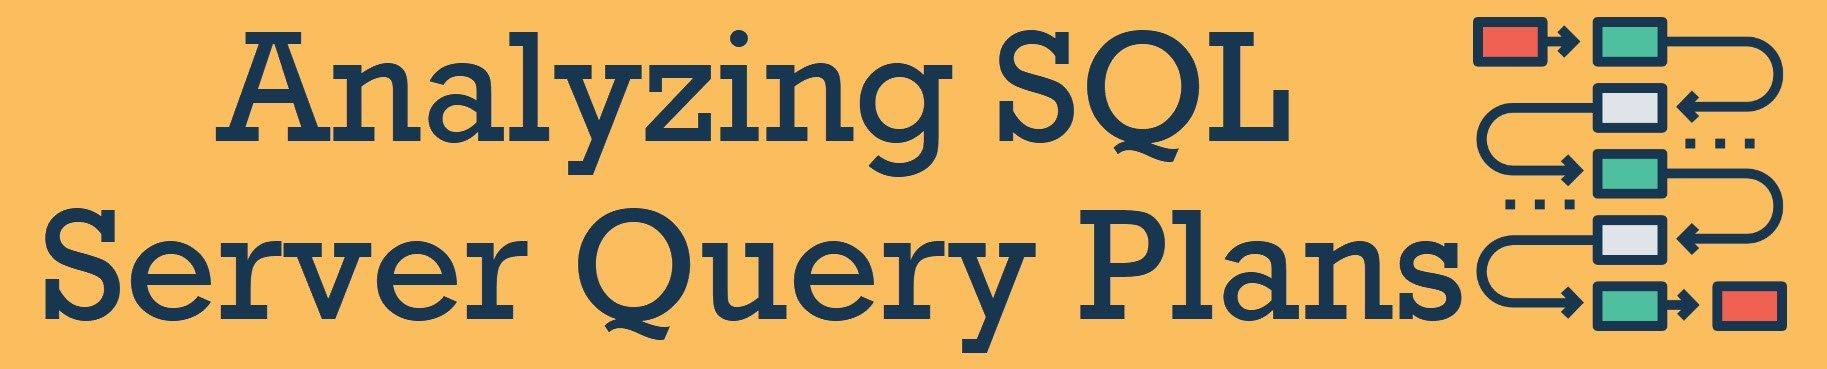 SQL Server Query Plans